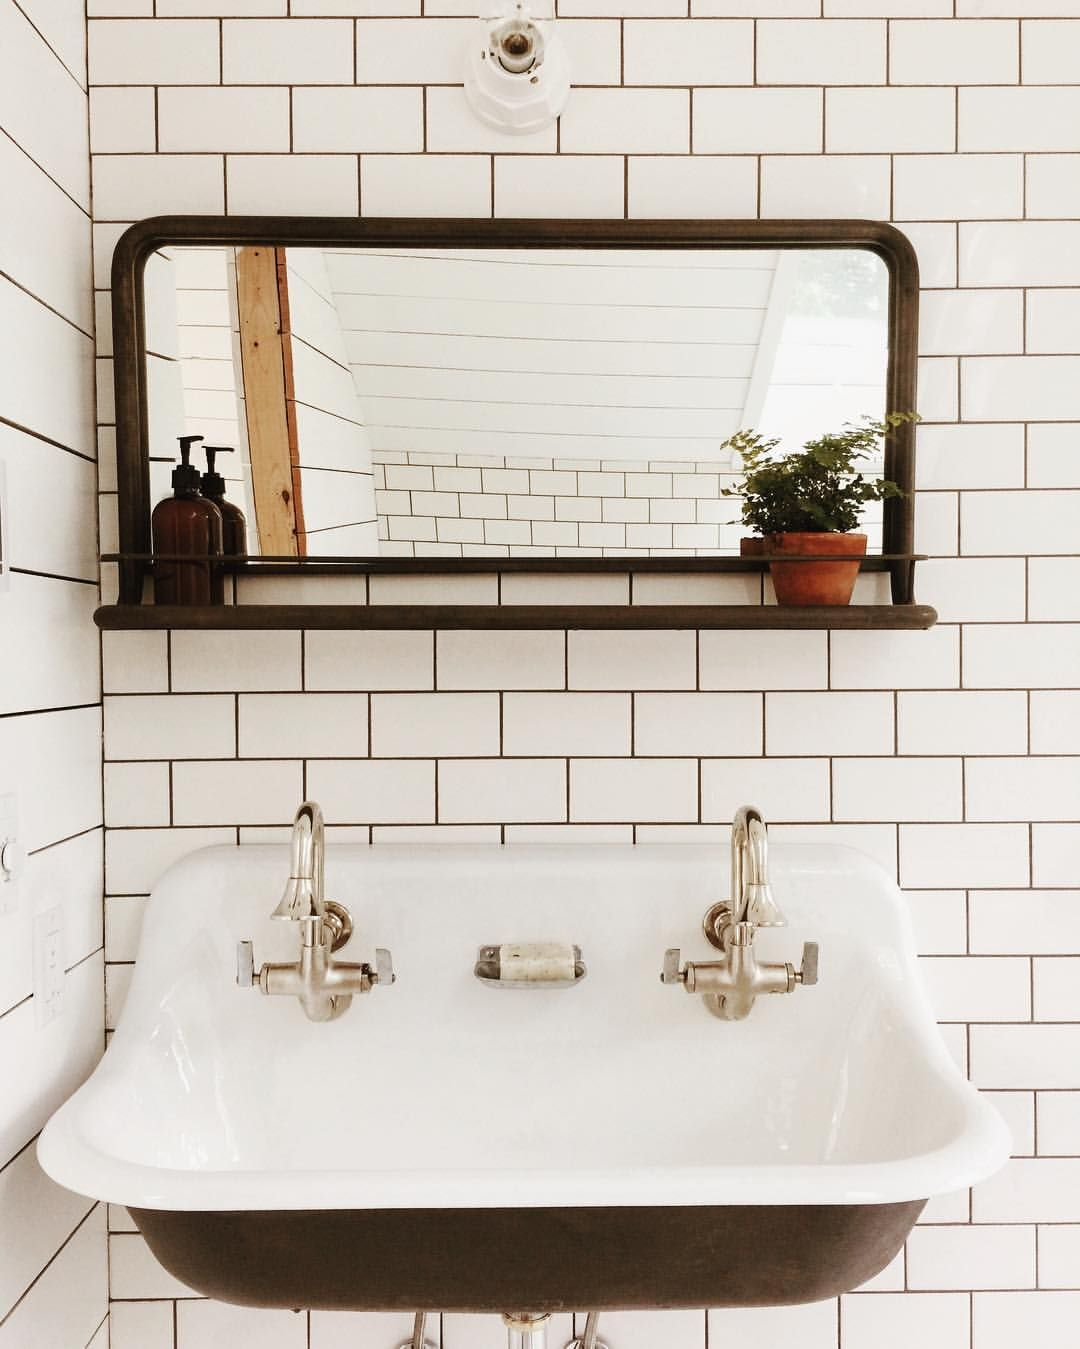 Fabulous Amazon Pharmacy Mirror Subway Tile Kohler Brockway Trough Download Free Architecture Designs Embacsunscenecom